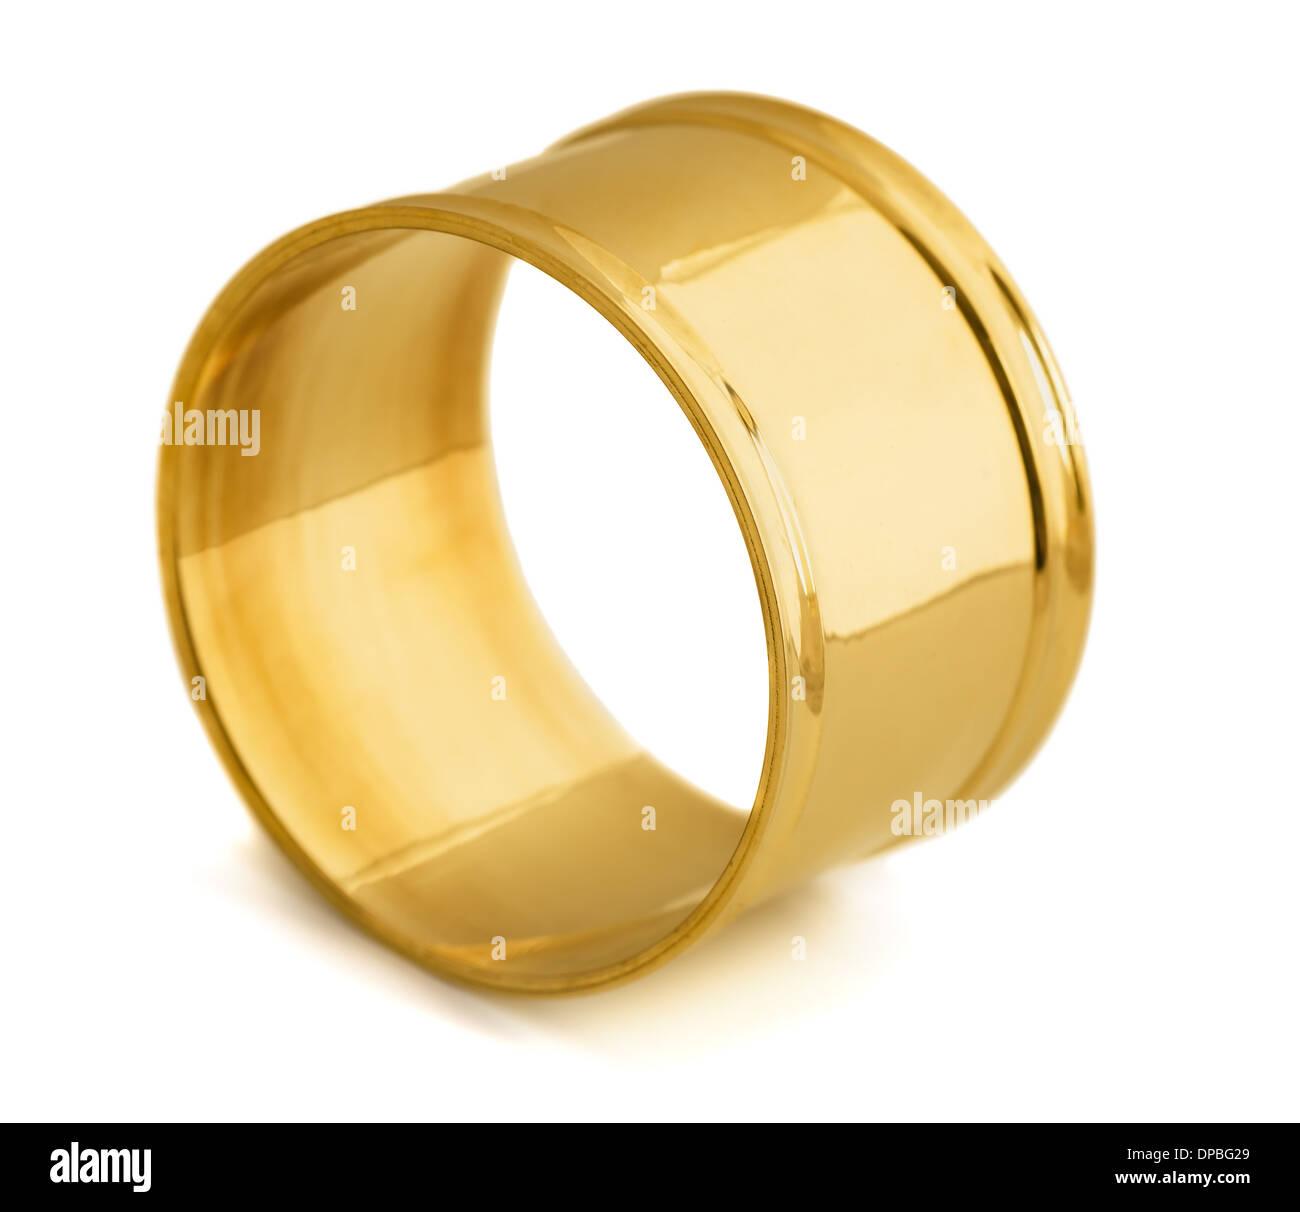 Empty golden napkin ring isolated on white - Stock Image